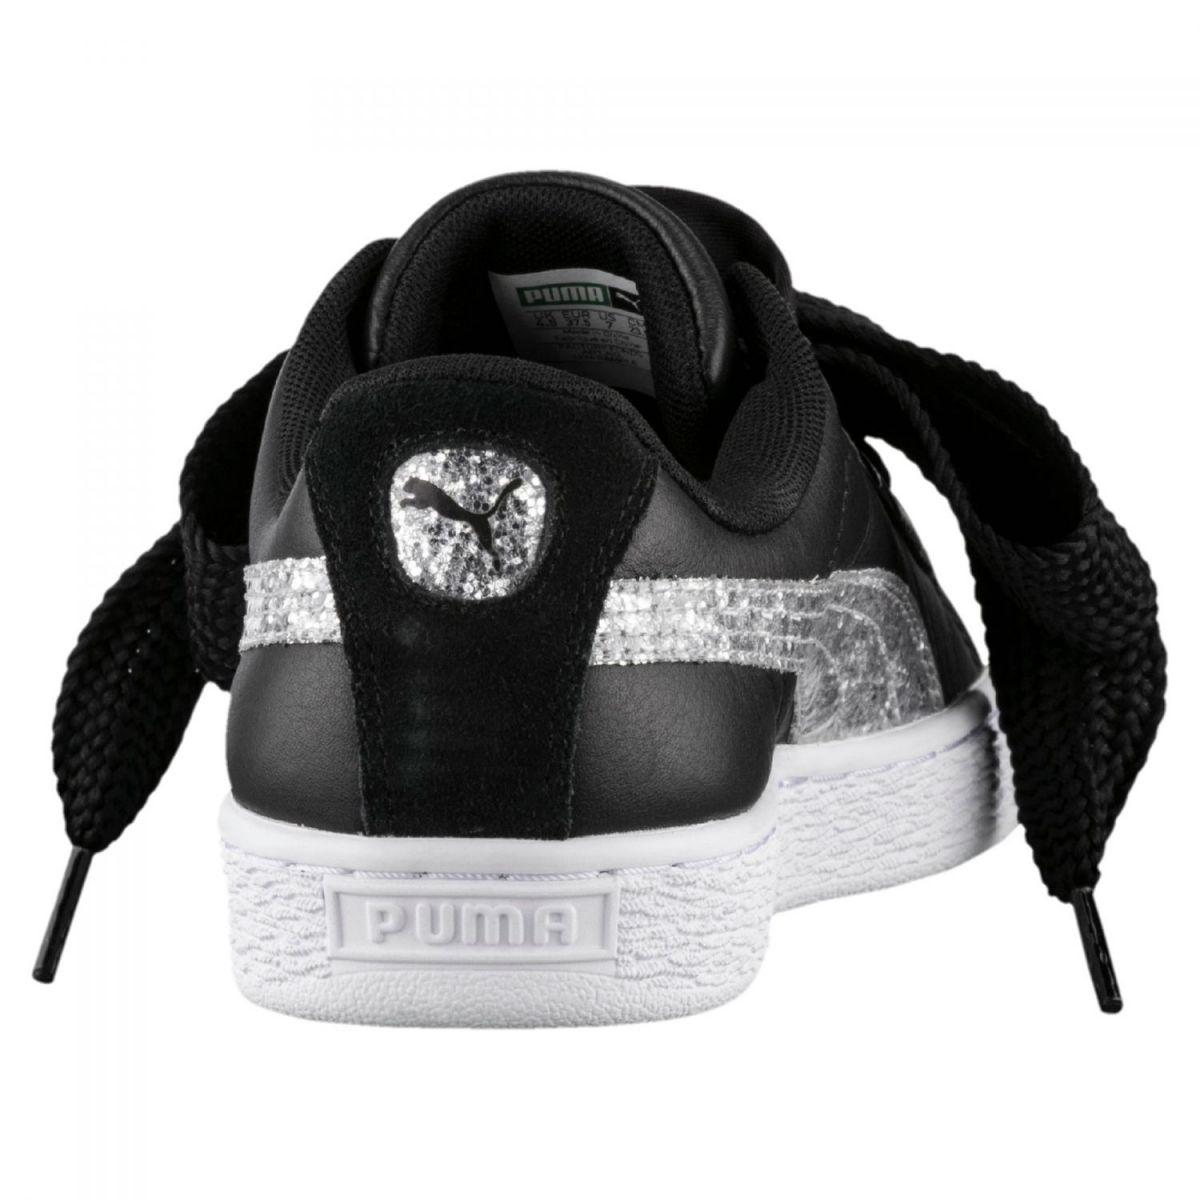 brand new 6e8b9 cba7a Sneaker Damen Günstige Puma kostenlose Schwarz Lieferung ...